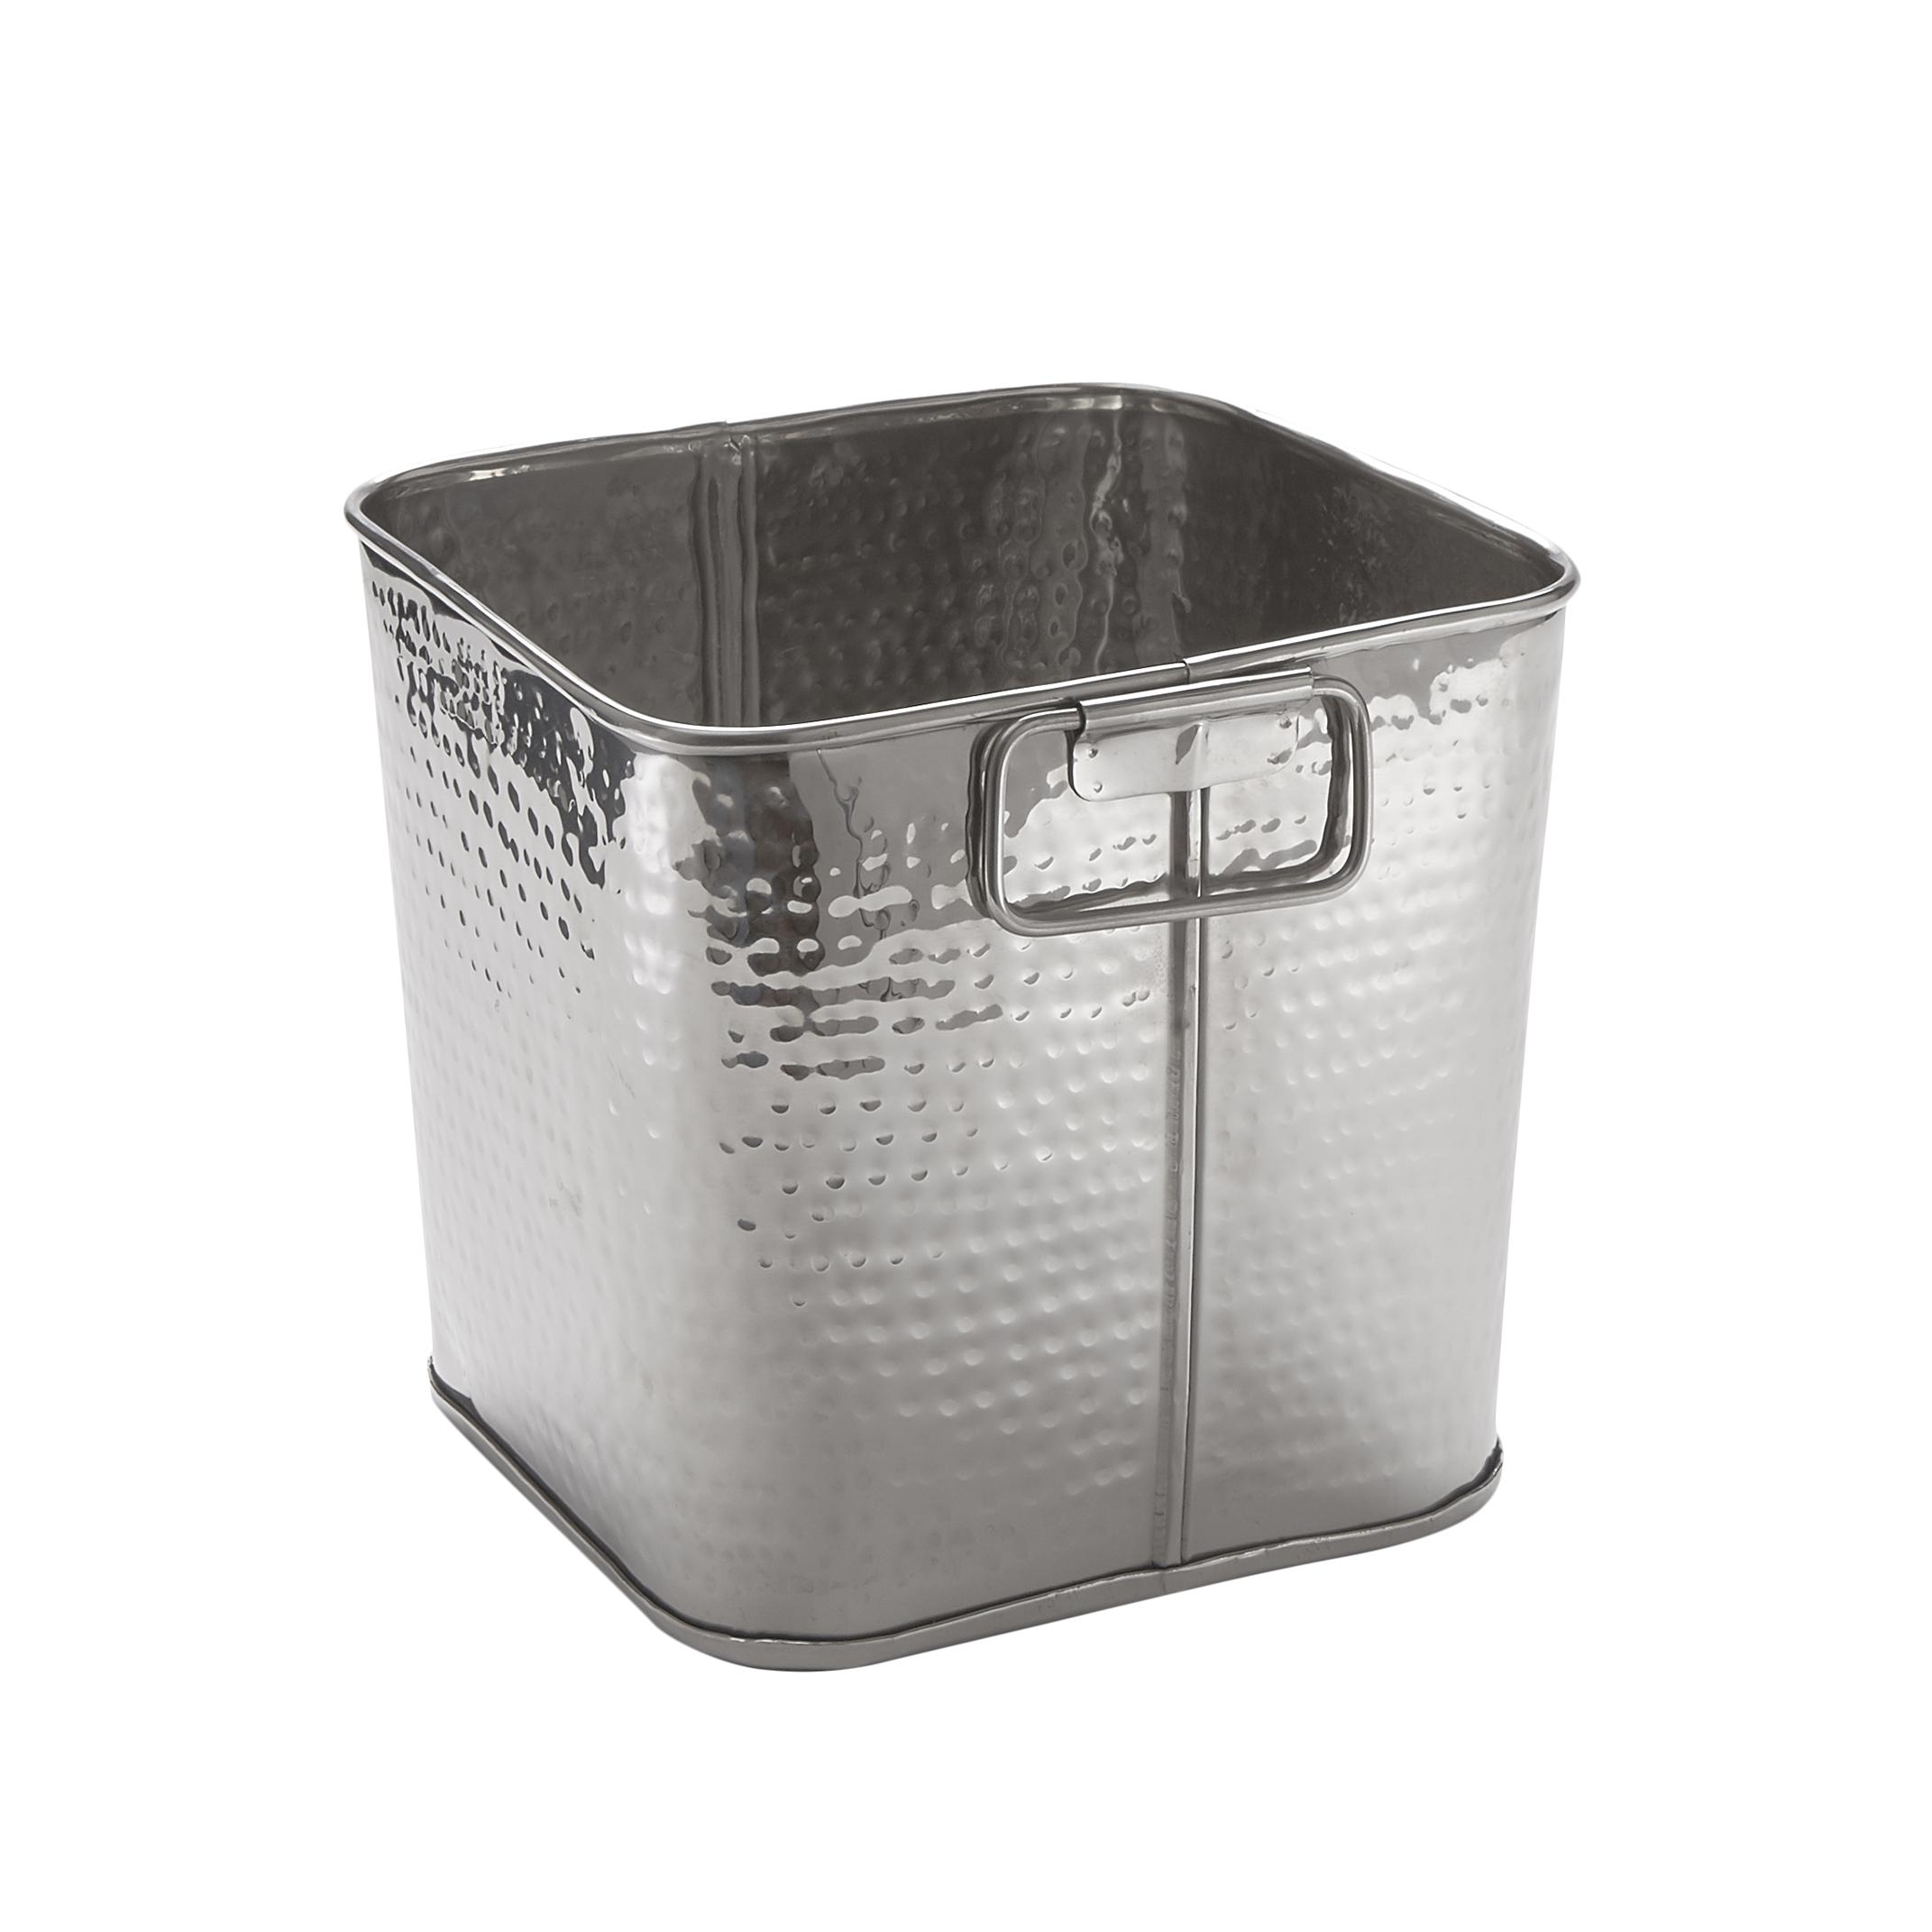 American Metalcraft STH8 beverage / ice tub